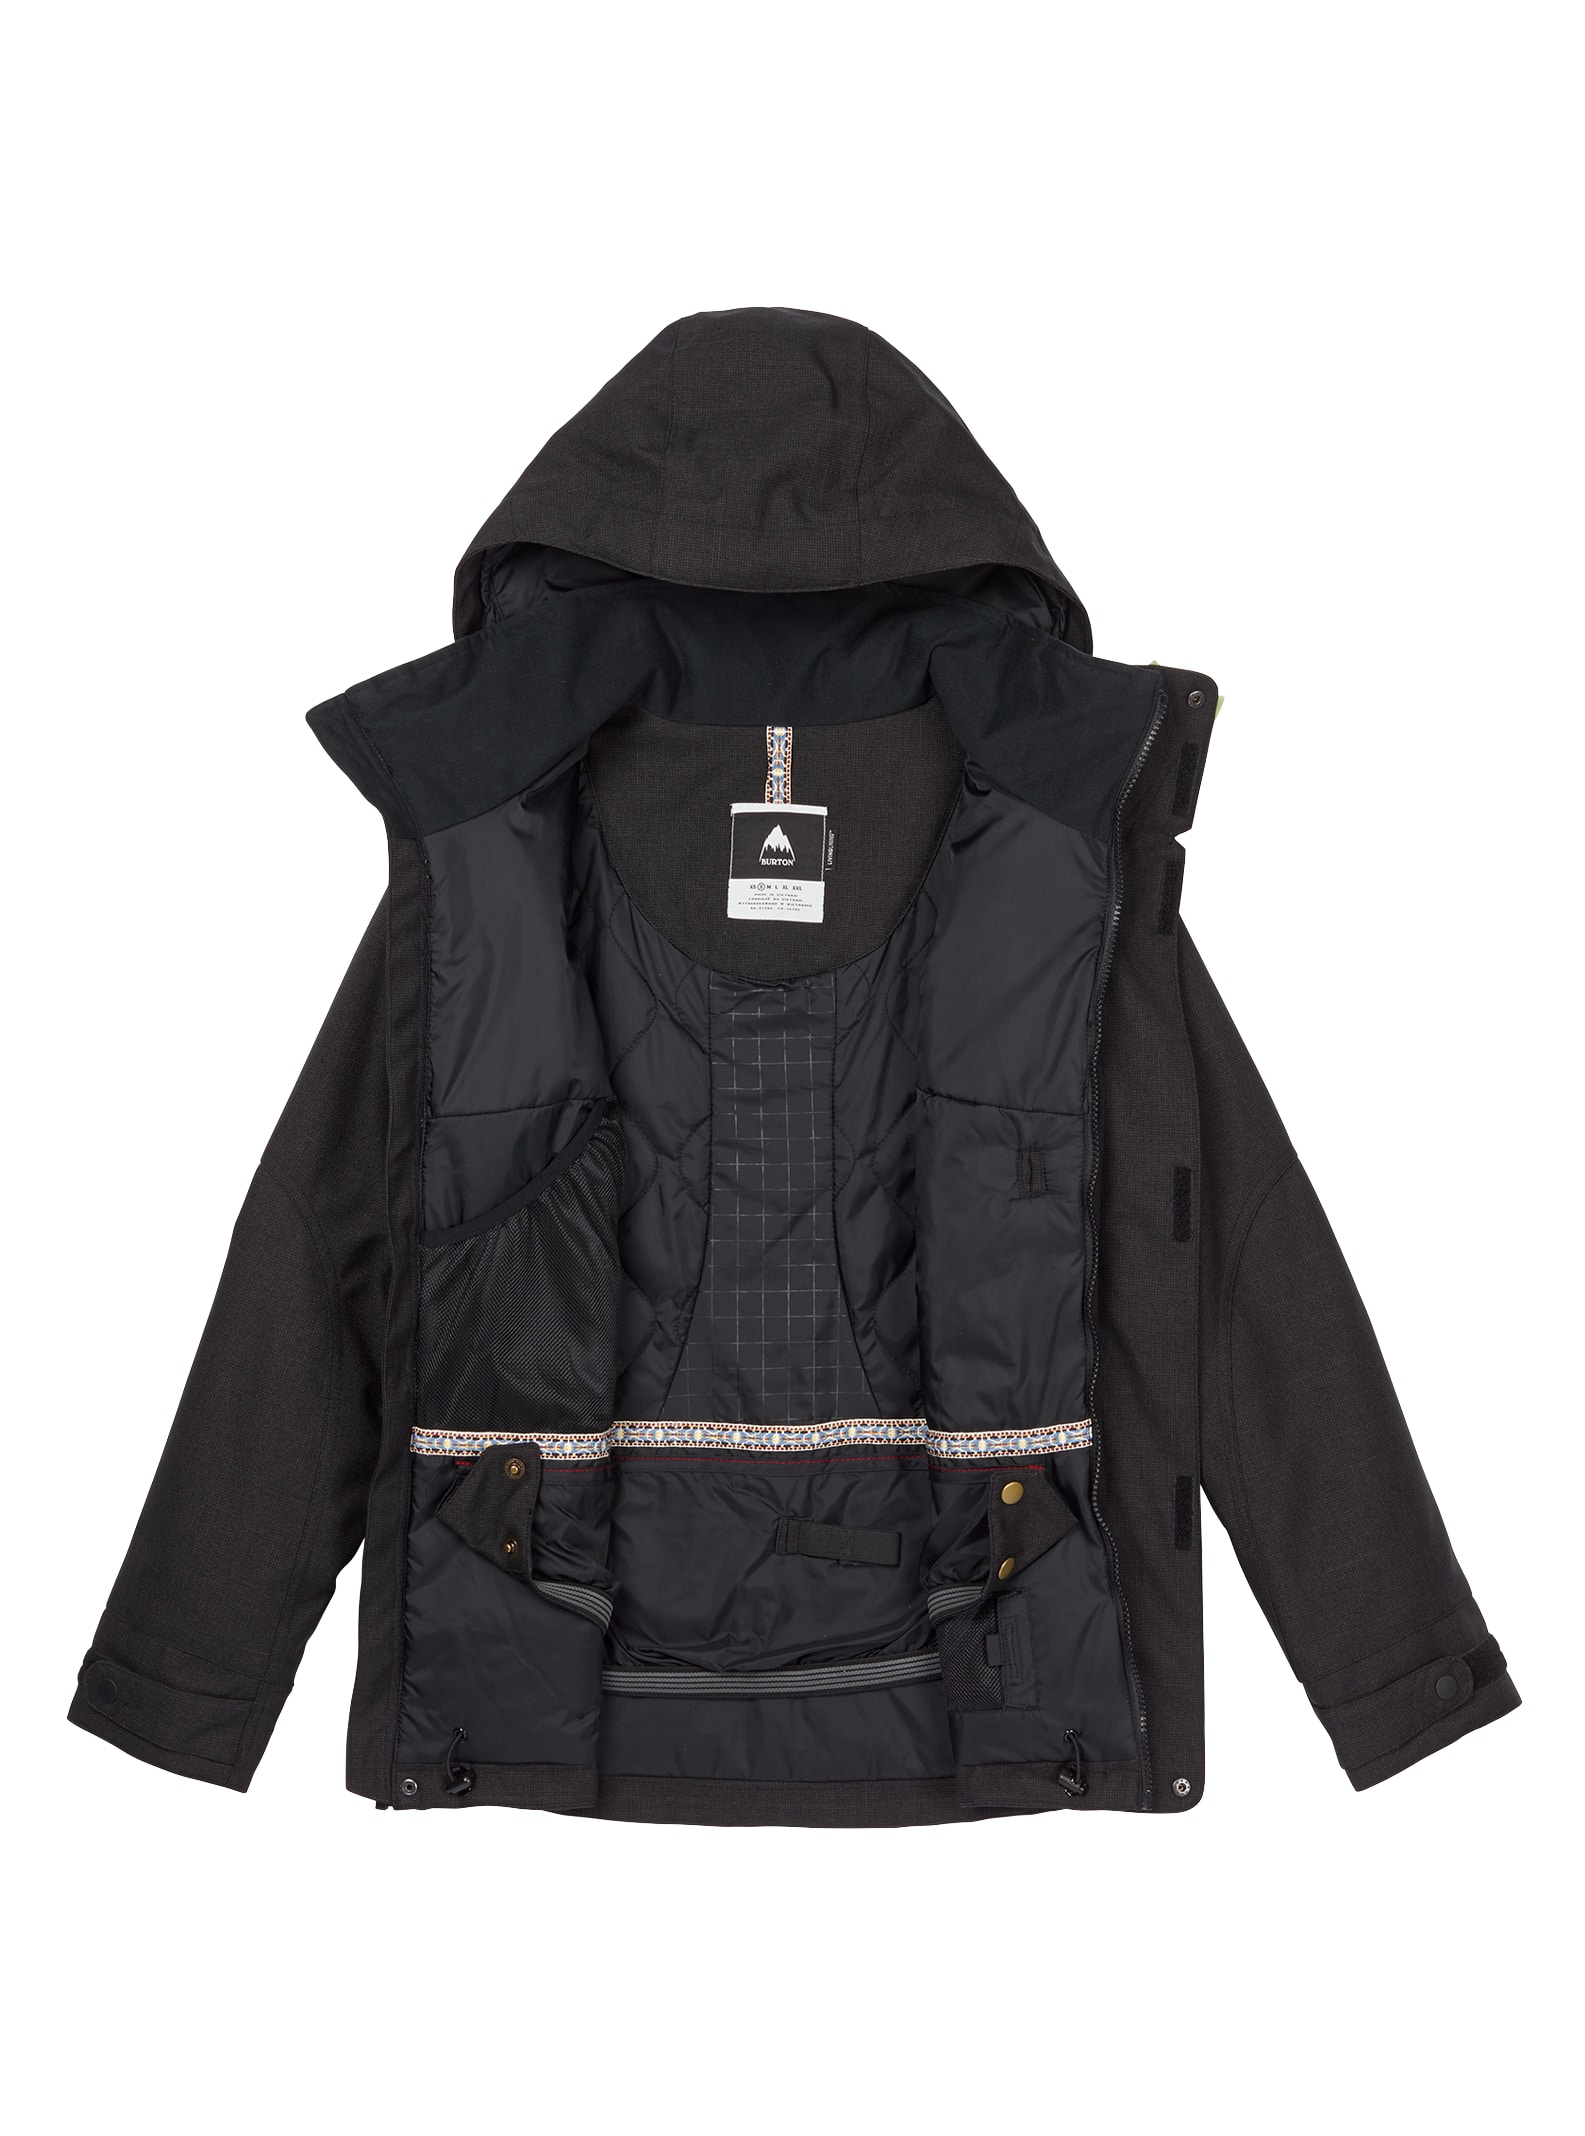 Women's Burton Jet Set Jacket